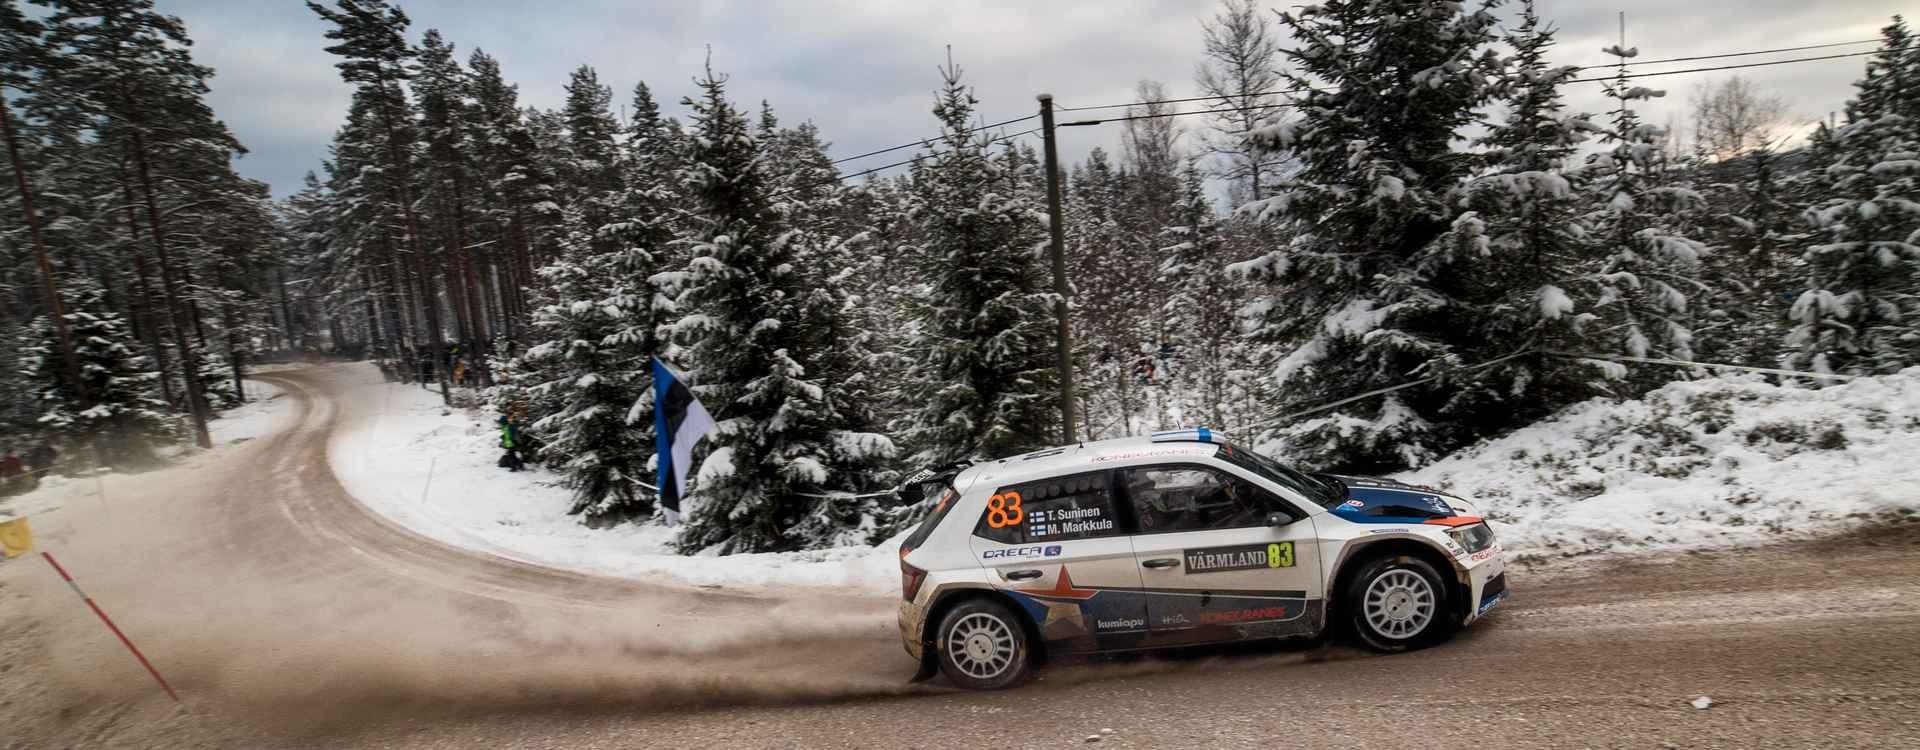 Rally Sweden: ŠKODA Fabia R5 cars shine in the snow